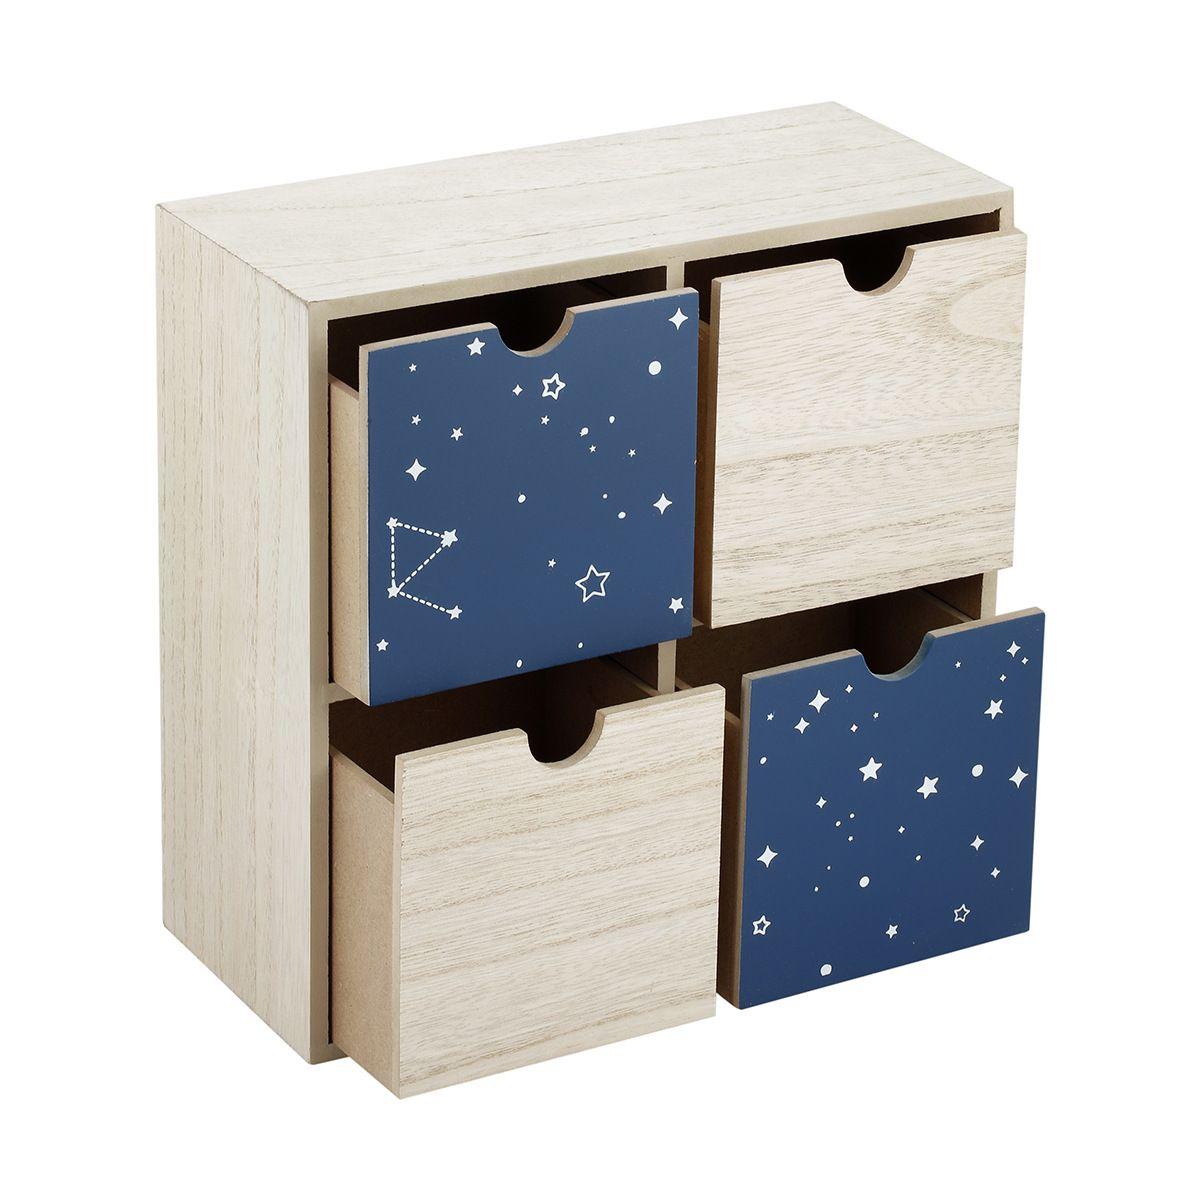 4 Drawer Storage Box Kmart Wishlist Storage Drawers Drawers